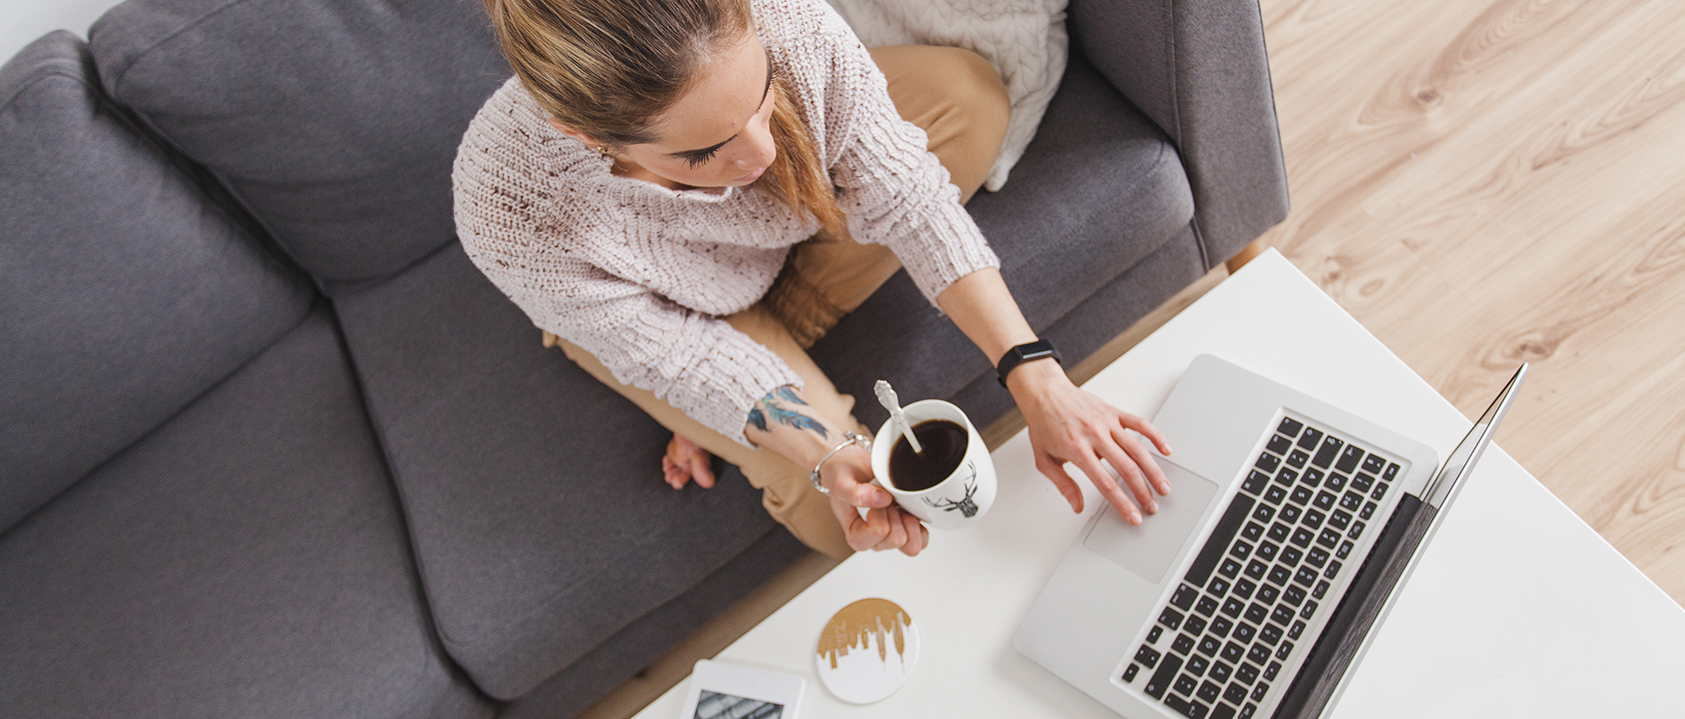 Freelance Worker on laptop